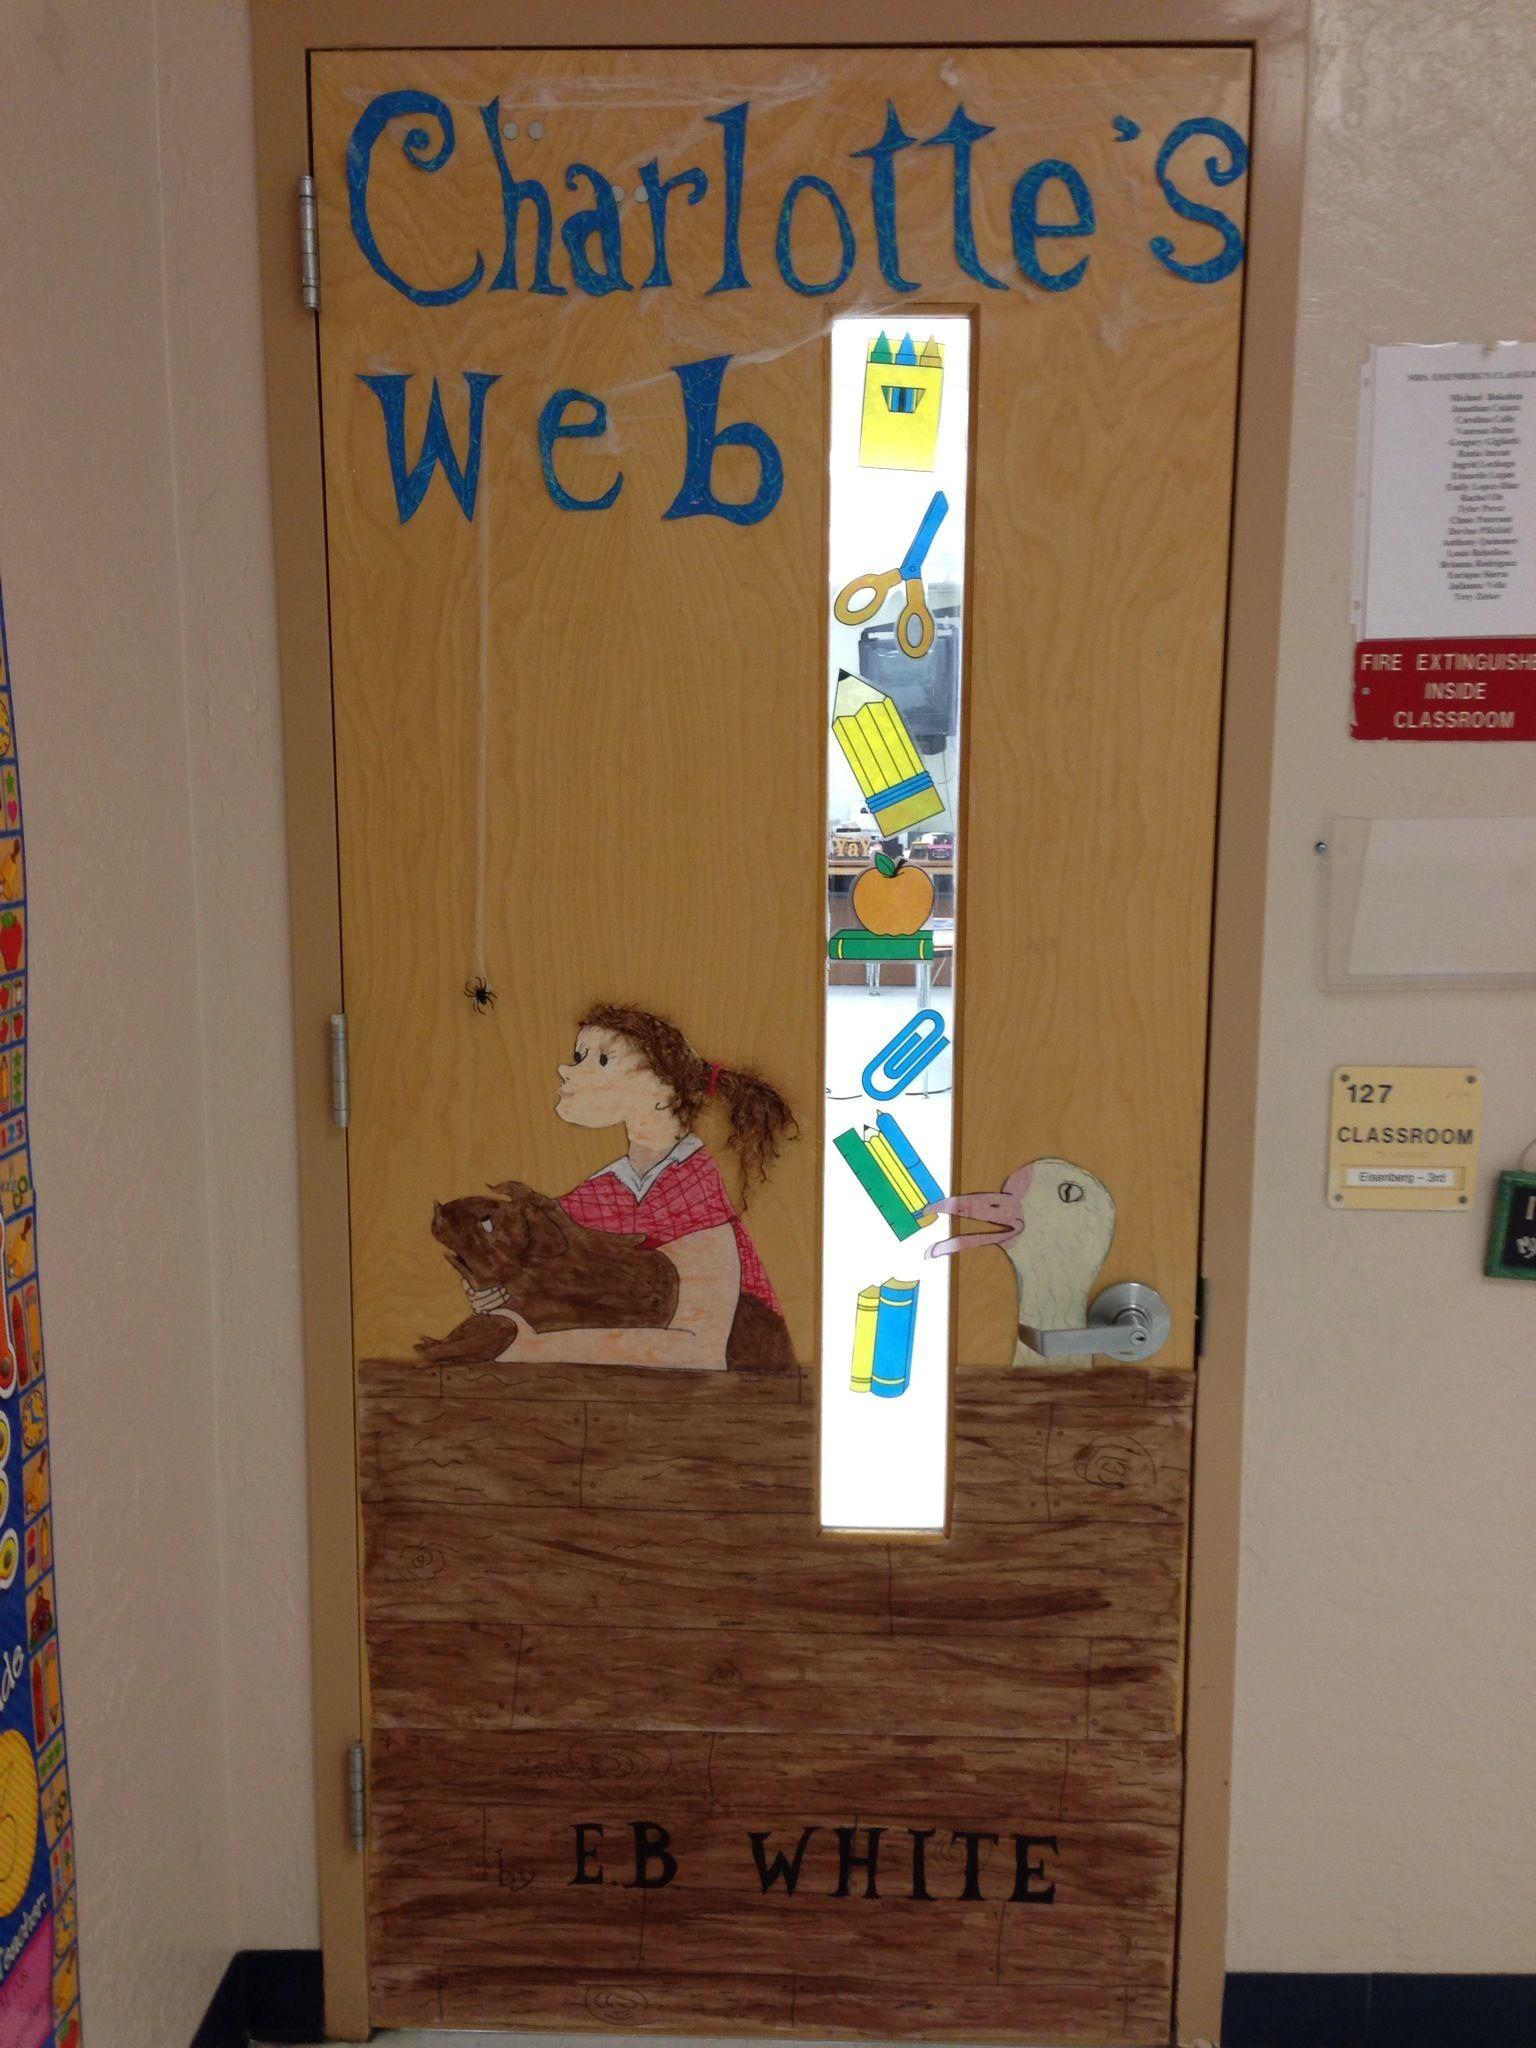 Classroom Craft Ideas : Teacher classroom door book craft decoration charlottes s